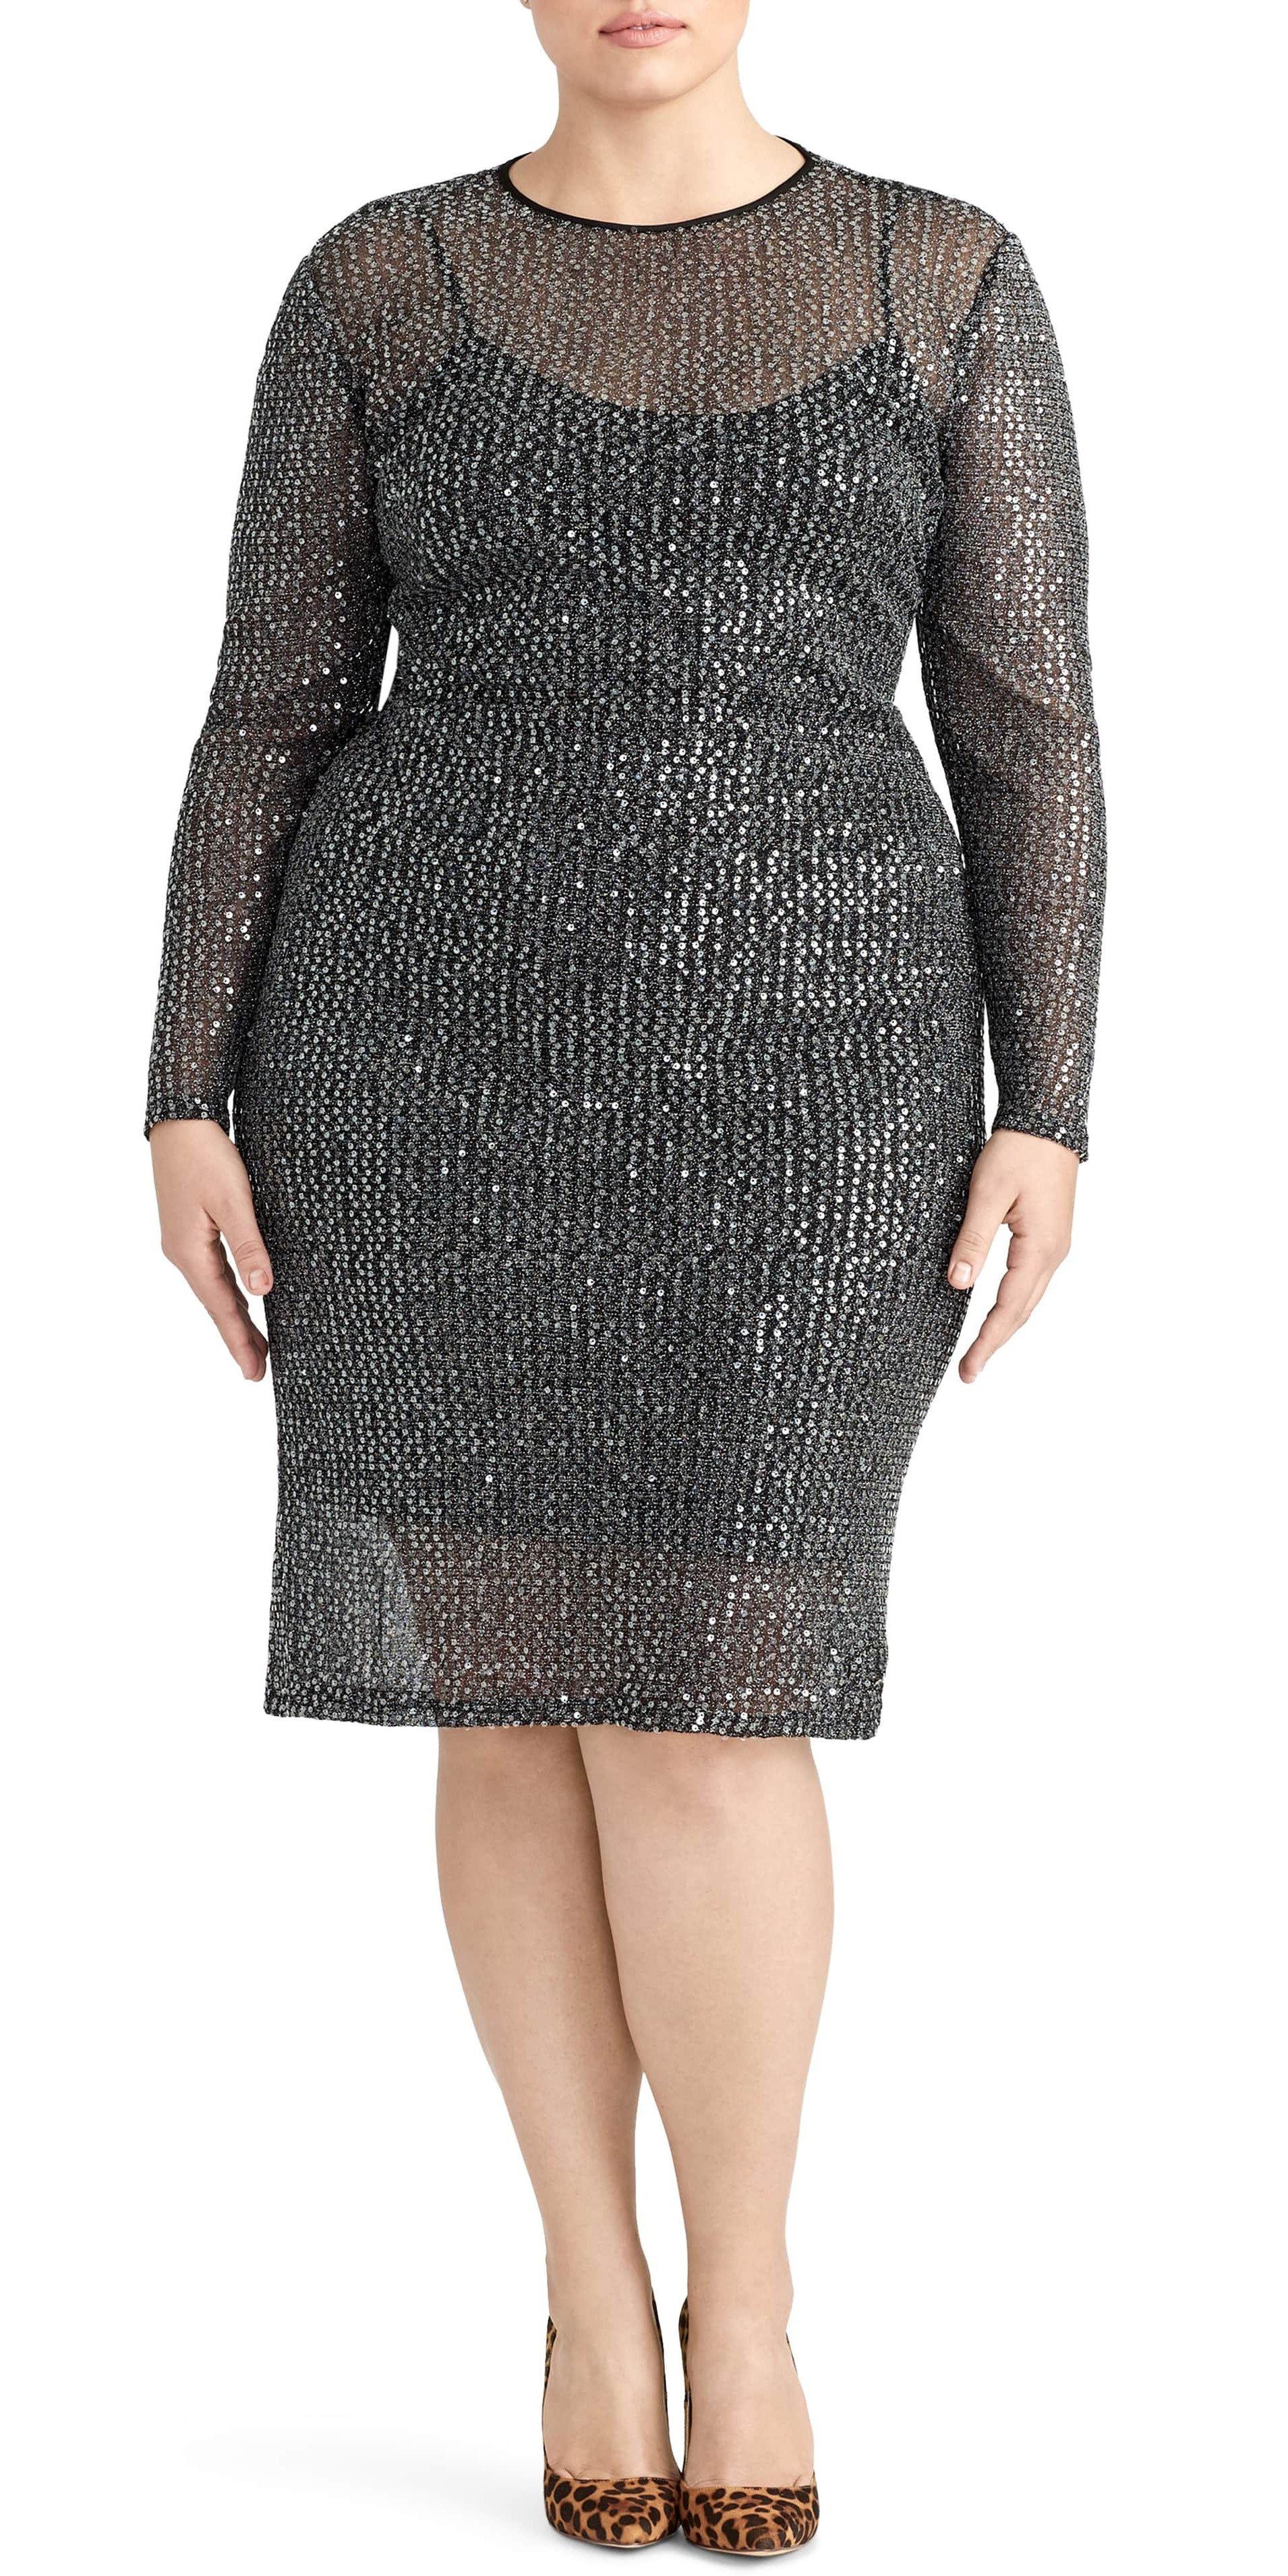 a560bfe7ec 51 Plus Size Party Dresses - Holiday and New Years Party Dresses - Plus Size  Fashion for Women - alexawebb.com  plussize  alexawebb